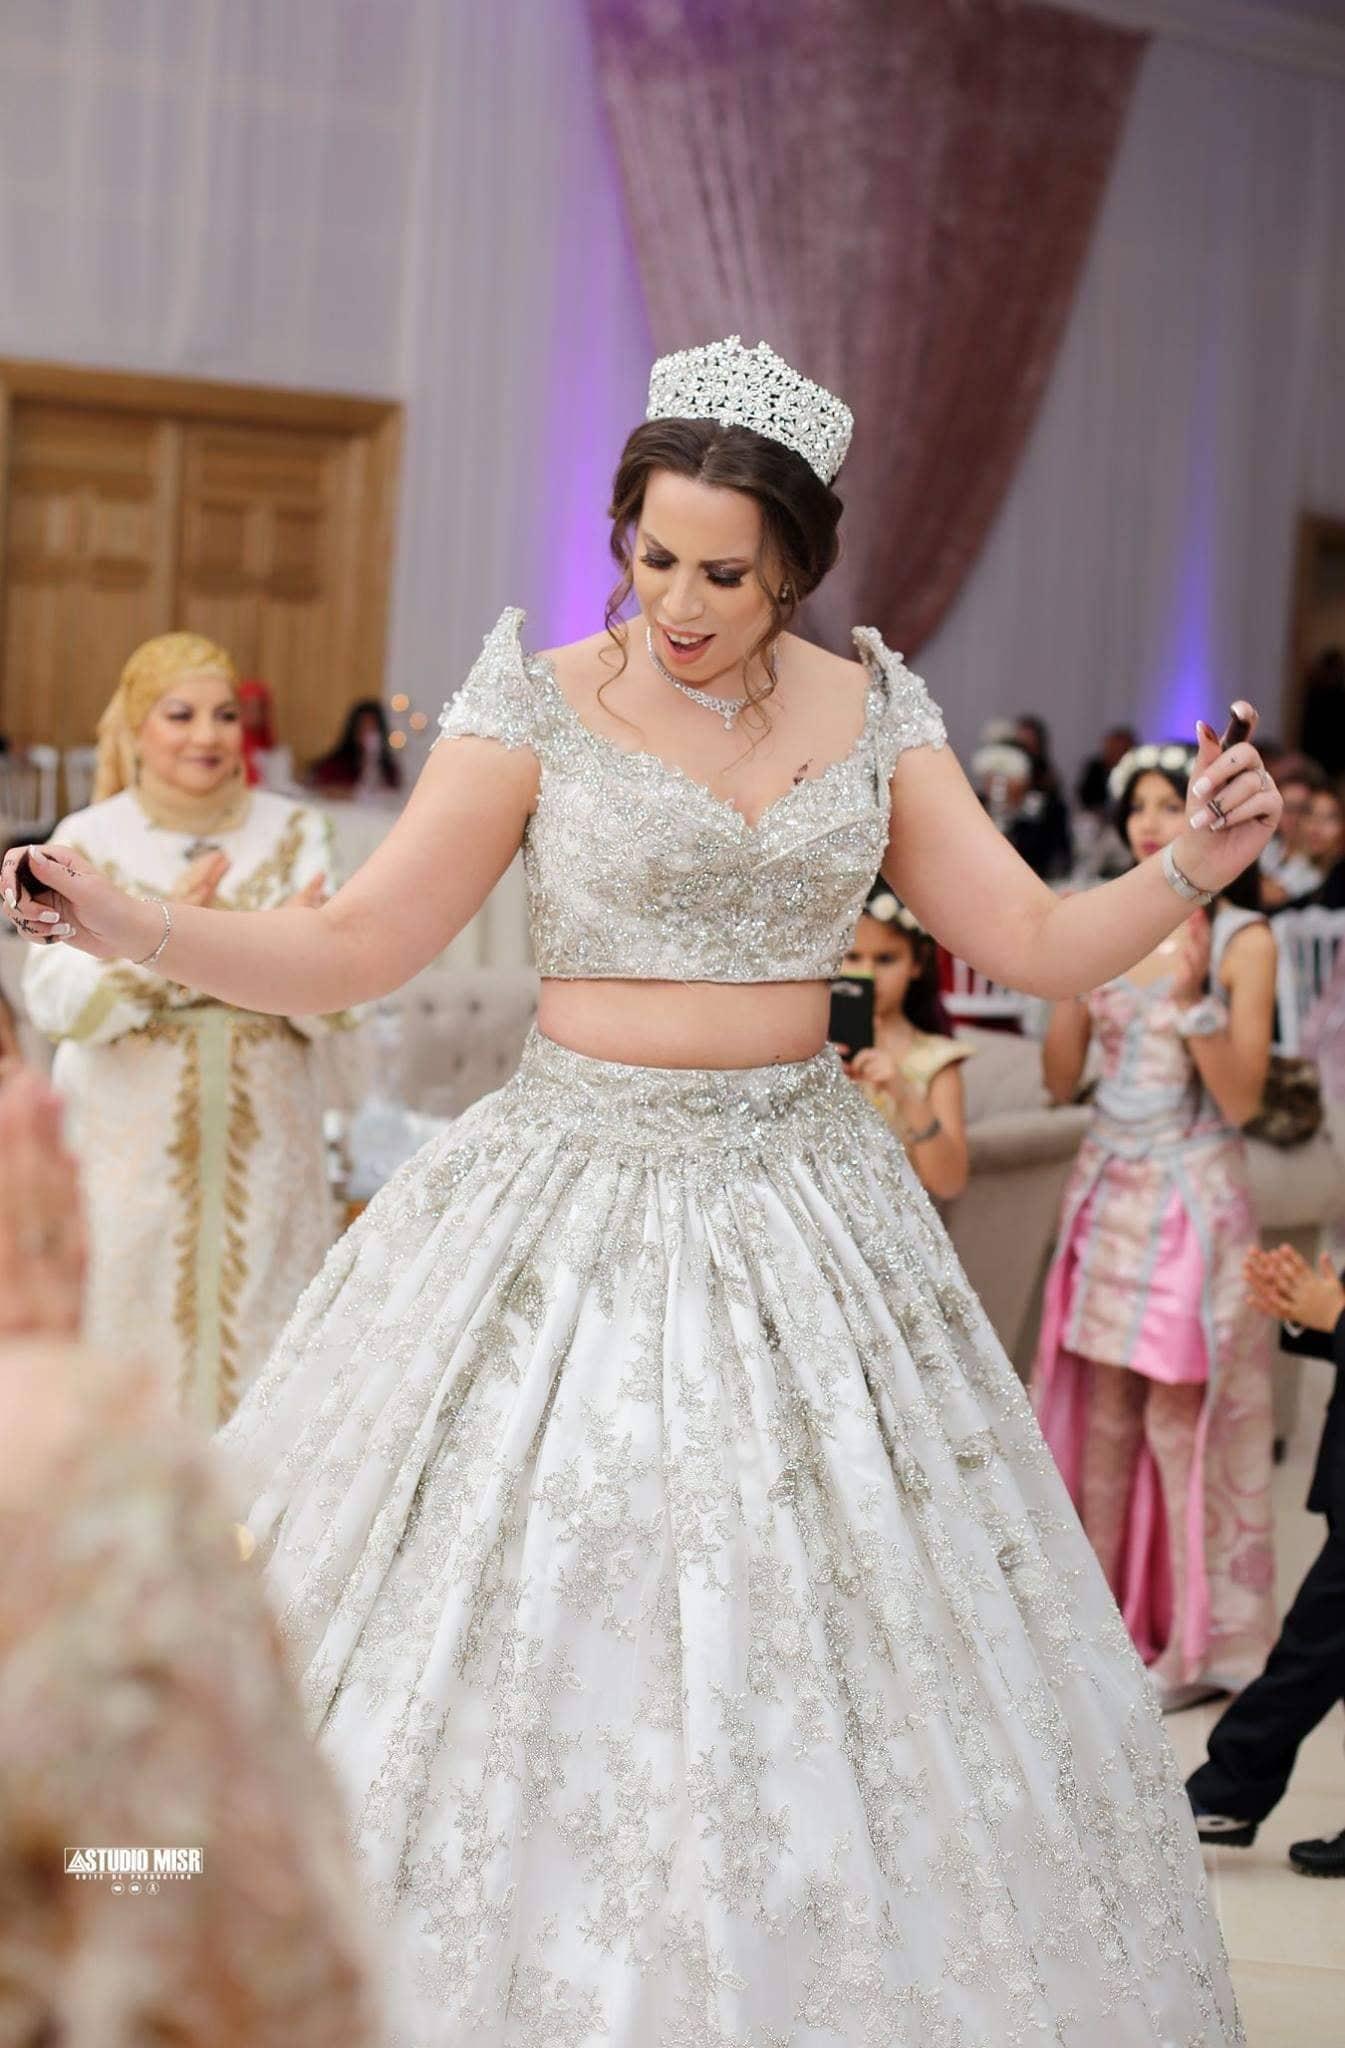 Emna_at6_plus_belles_mariées_tunisiennes2019